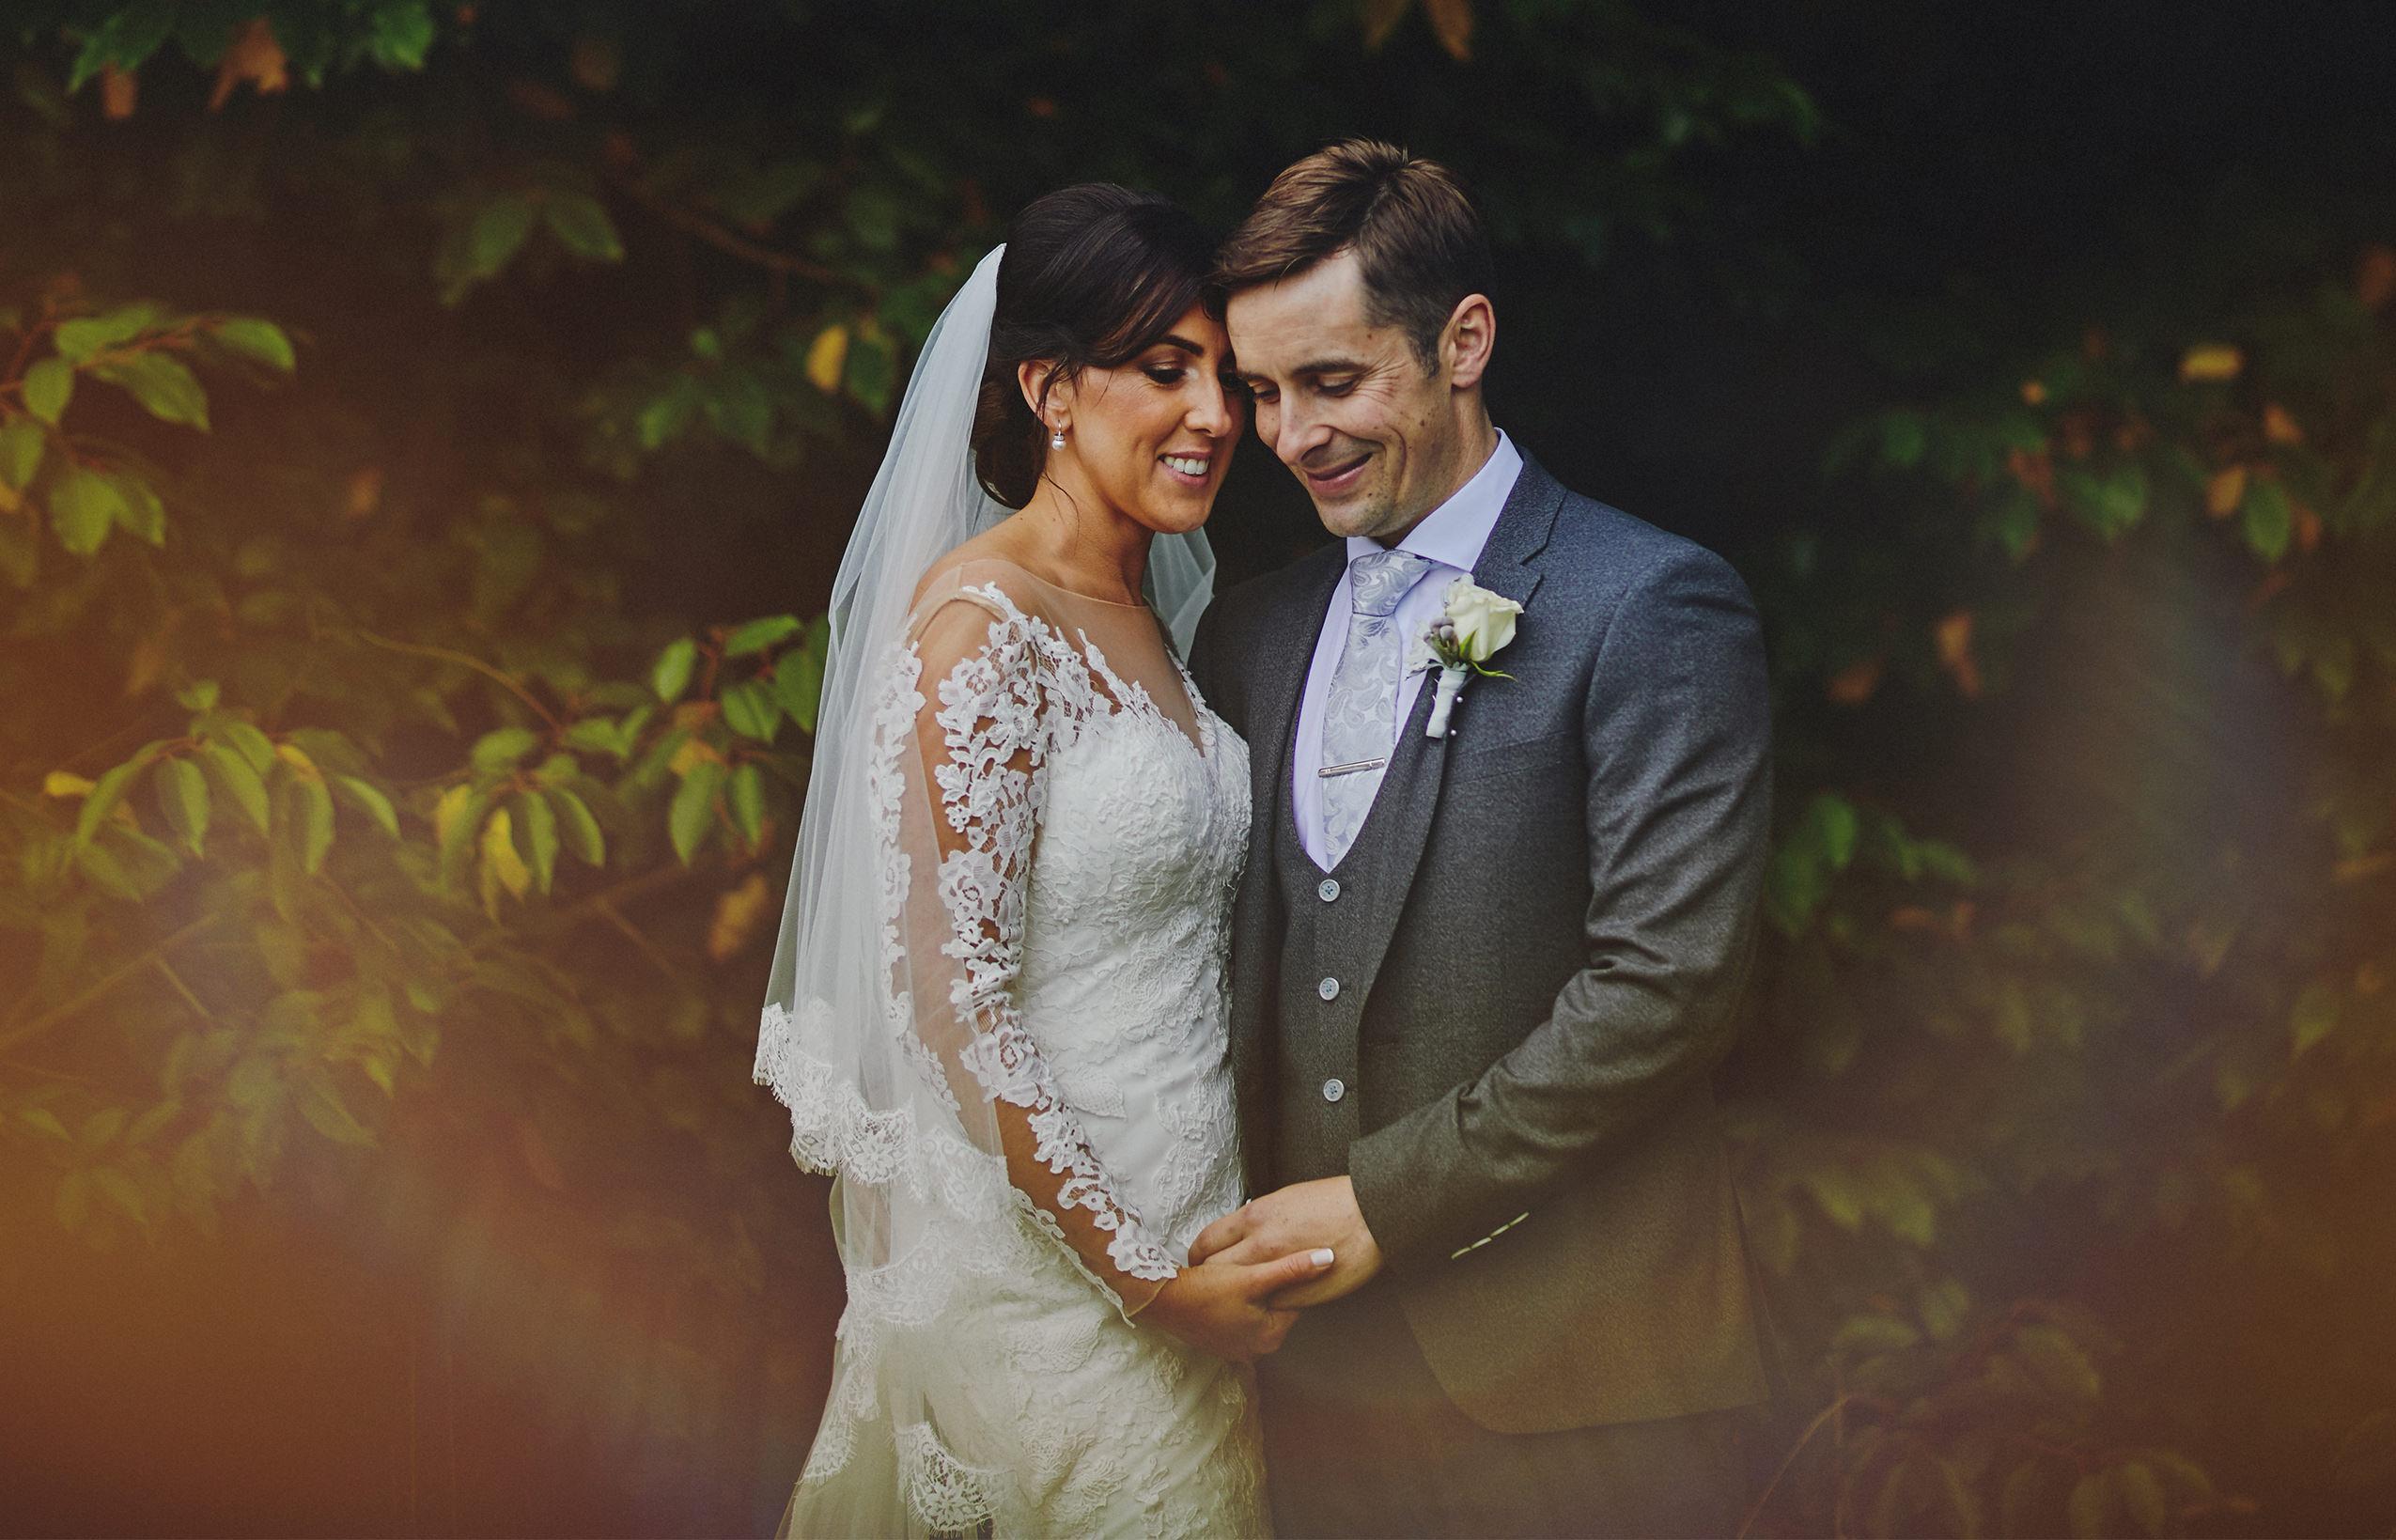 Keadeen Hotel Wedding Kildare Emo Court House photos